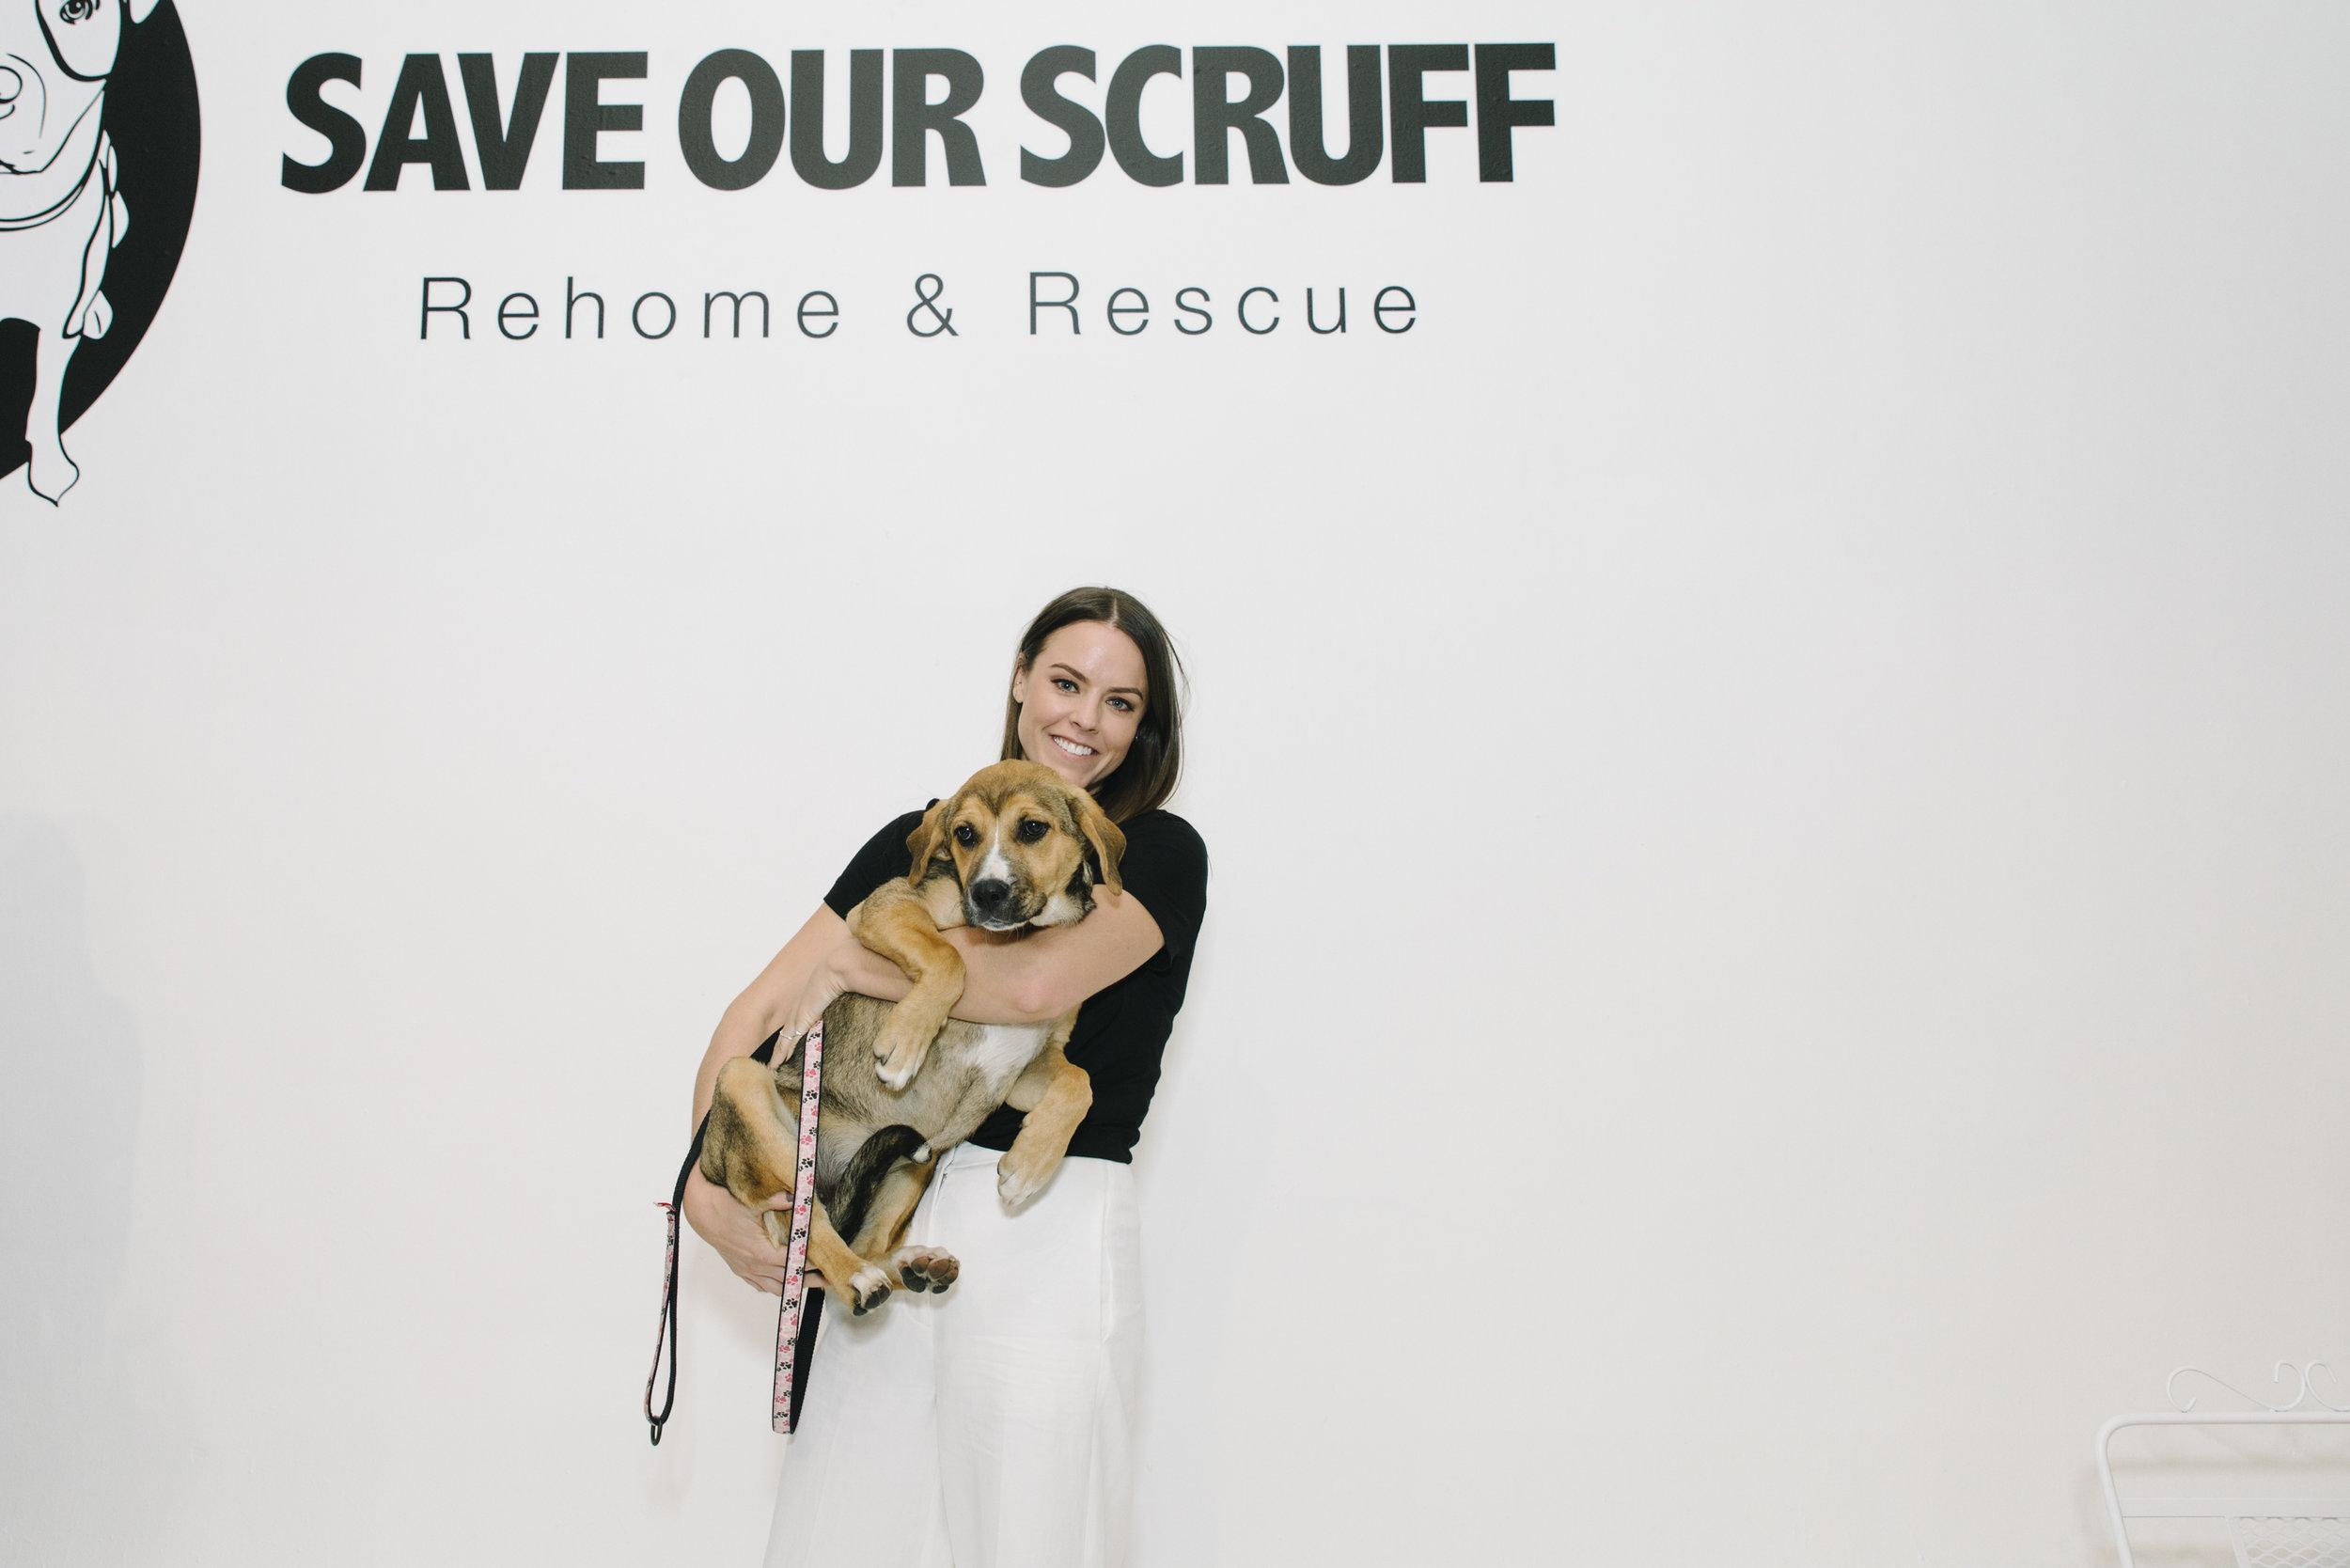 StefEthan-SaveOurScruff-ScruffSocal-SOS-DogRescue-District28Events-D28-TorontoEventPhotographer-Event-SOSDogRescue-28.JPG